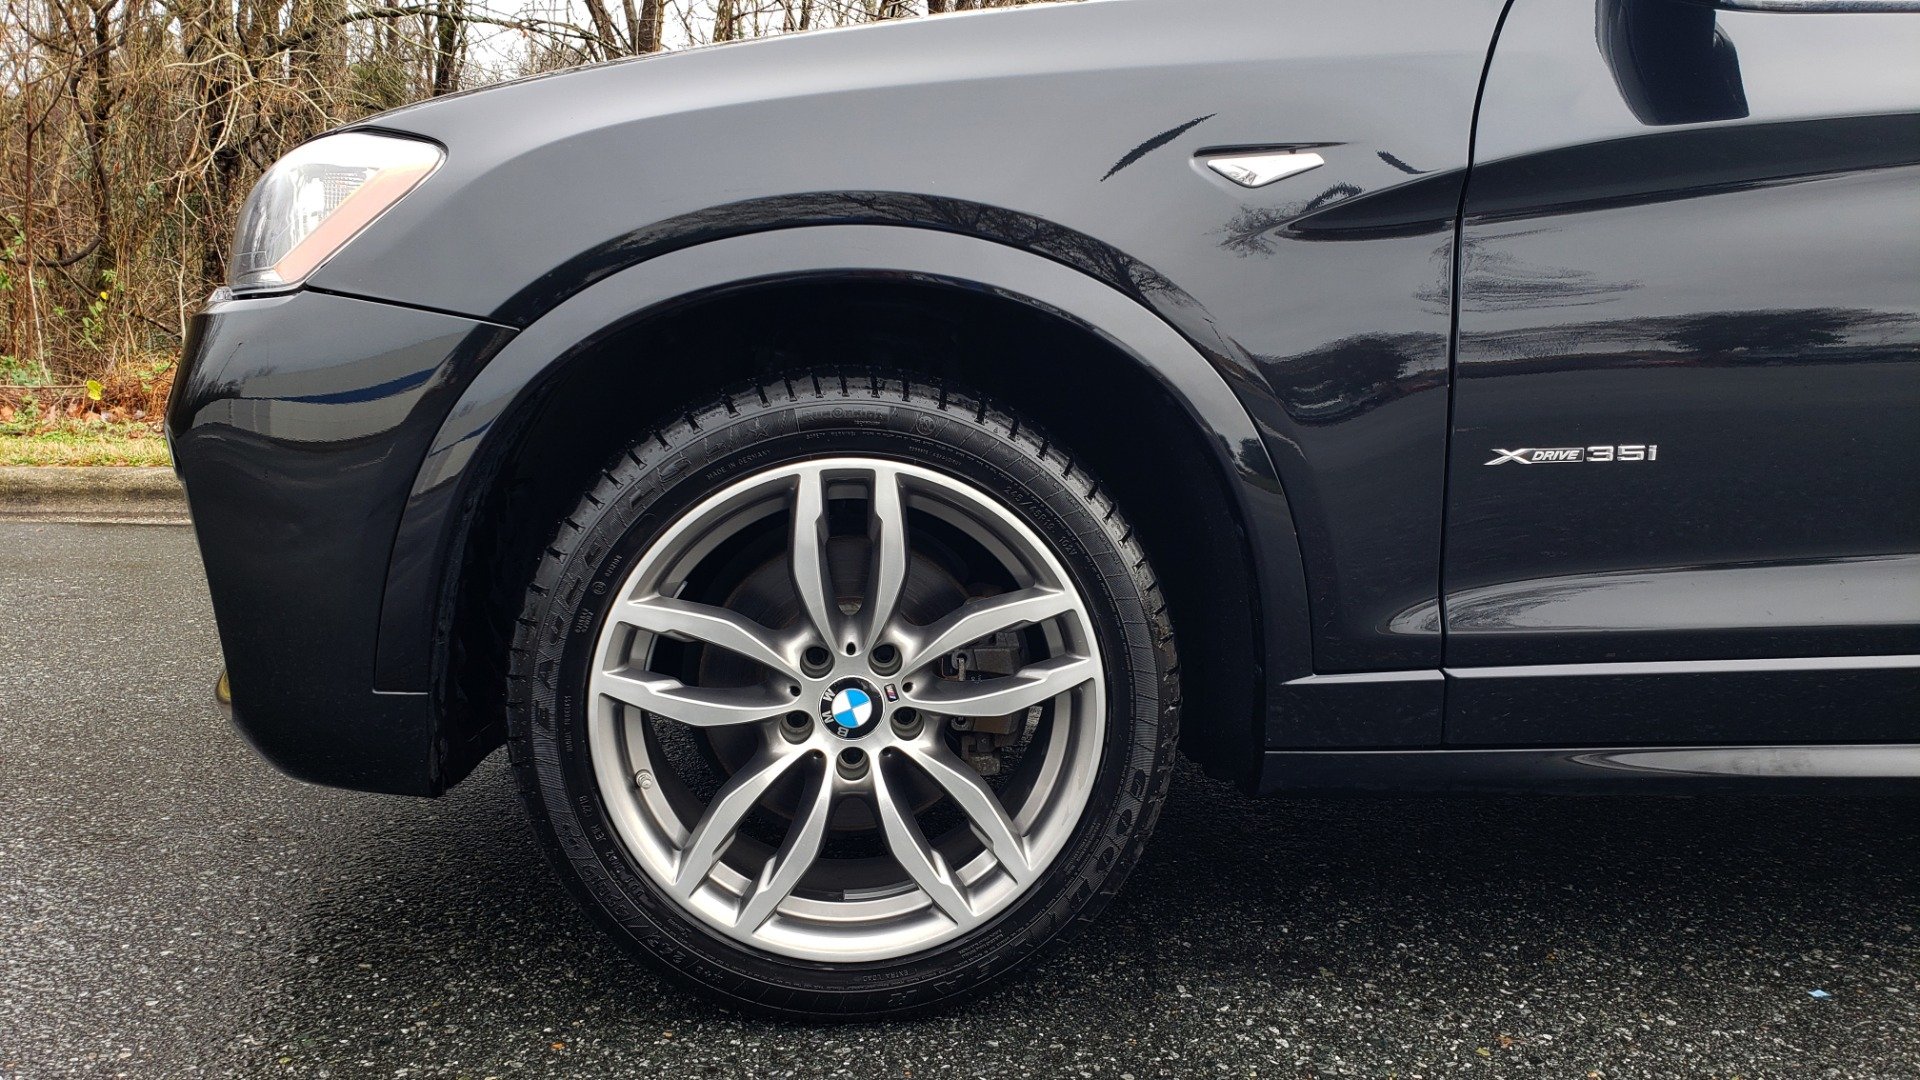 Used 2017 BMW X3 XDRIVE35I M-SPORT / DRVR ASST PLUS / TECHNOLOGY / HUD / BLIND SPOT for sale Sold at Formula Imports in Charlotte NC 28227 74